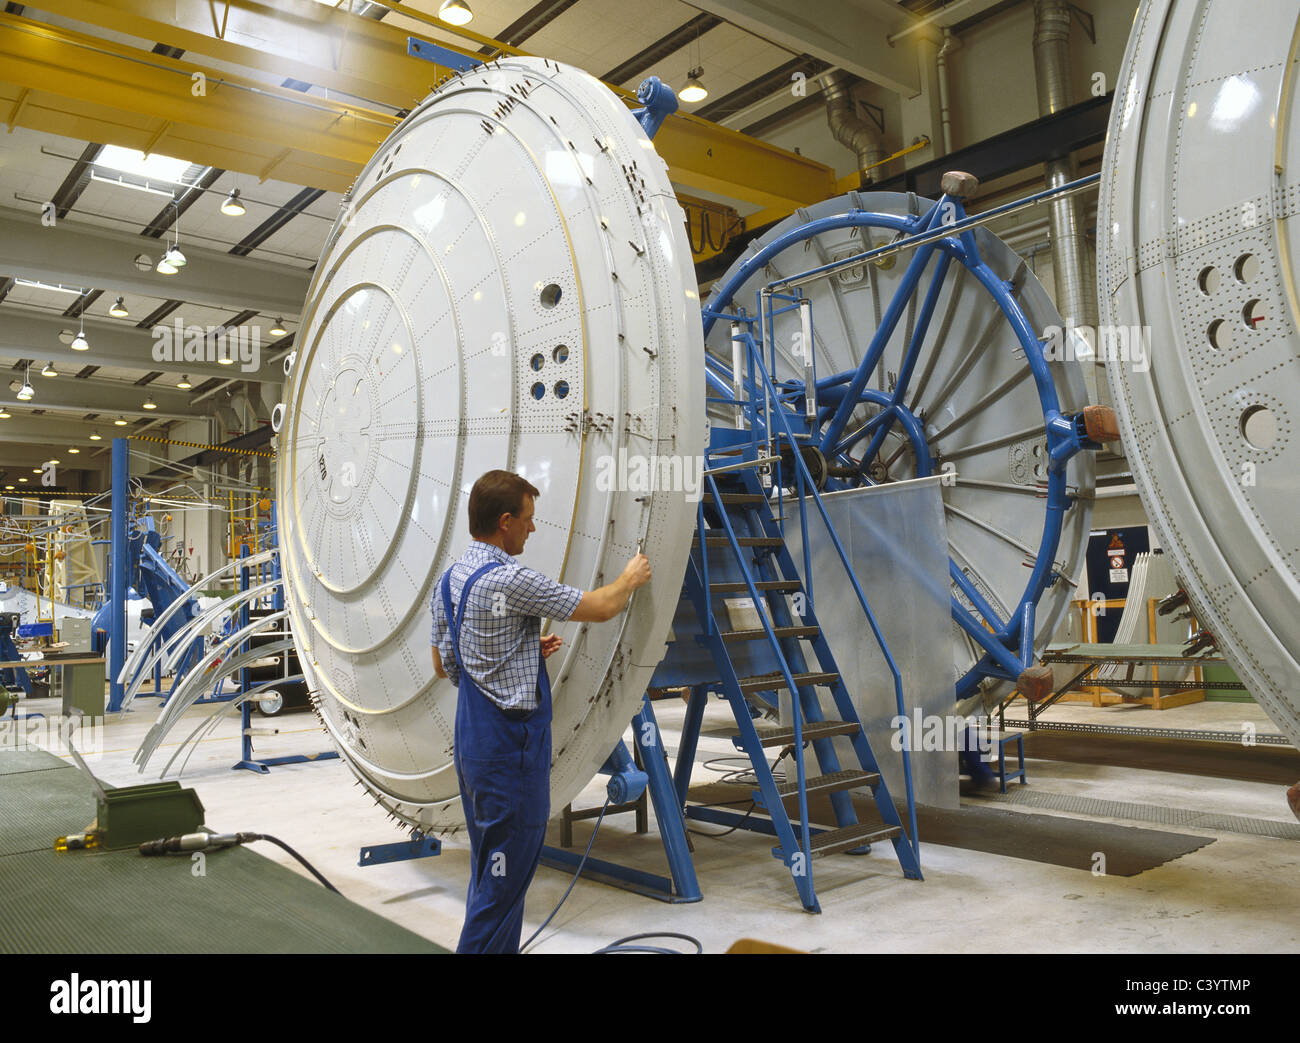 Adult, Aeronautics, Aeroplane, Airbus, Aircraft, Airplane, Assembling, Assembly, Aviation, Eads, Engineer, Engineering, - Stock Image